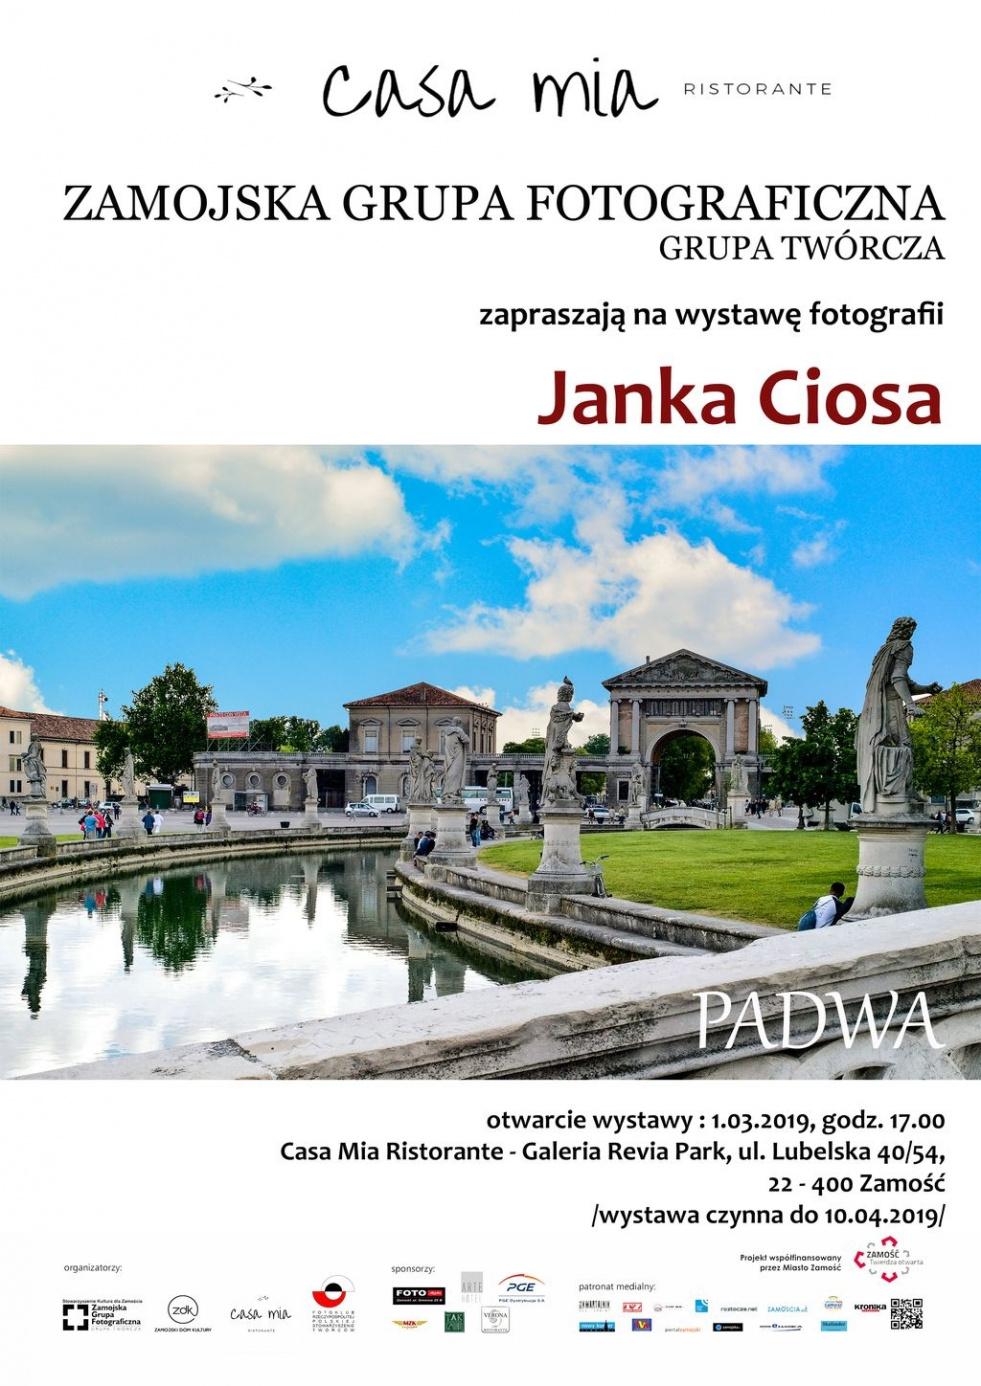 """PADWA"" - wystawa fotografii Janka Ciosa ZGF GT"